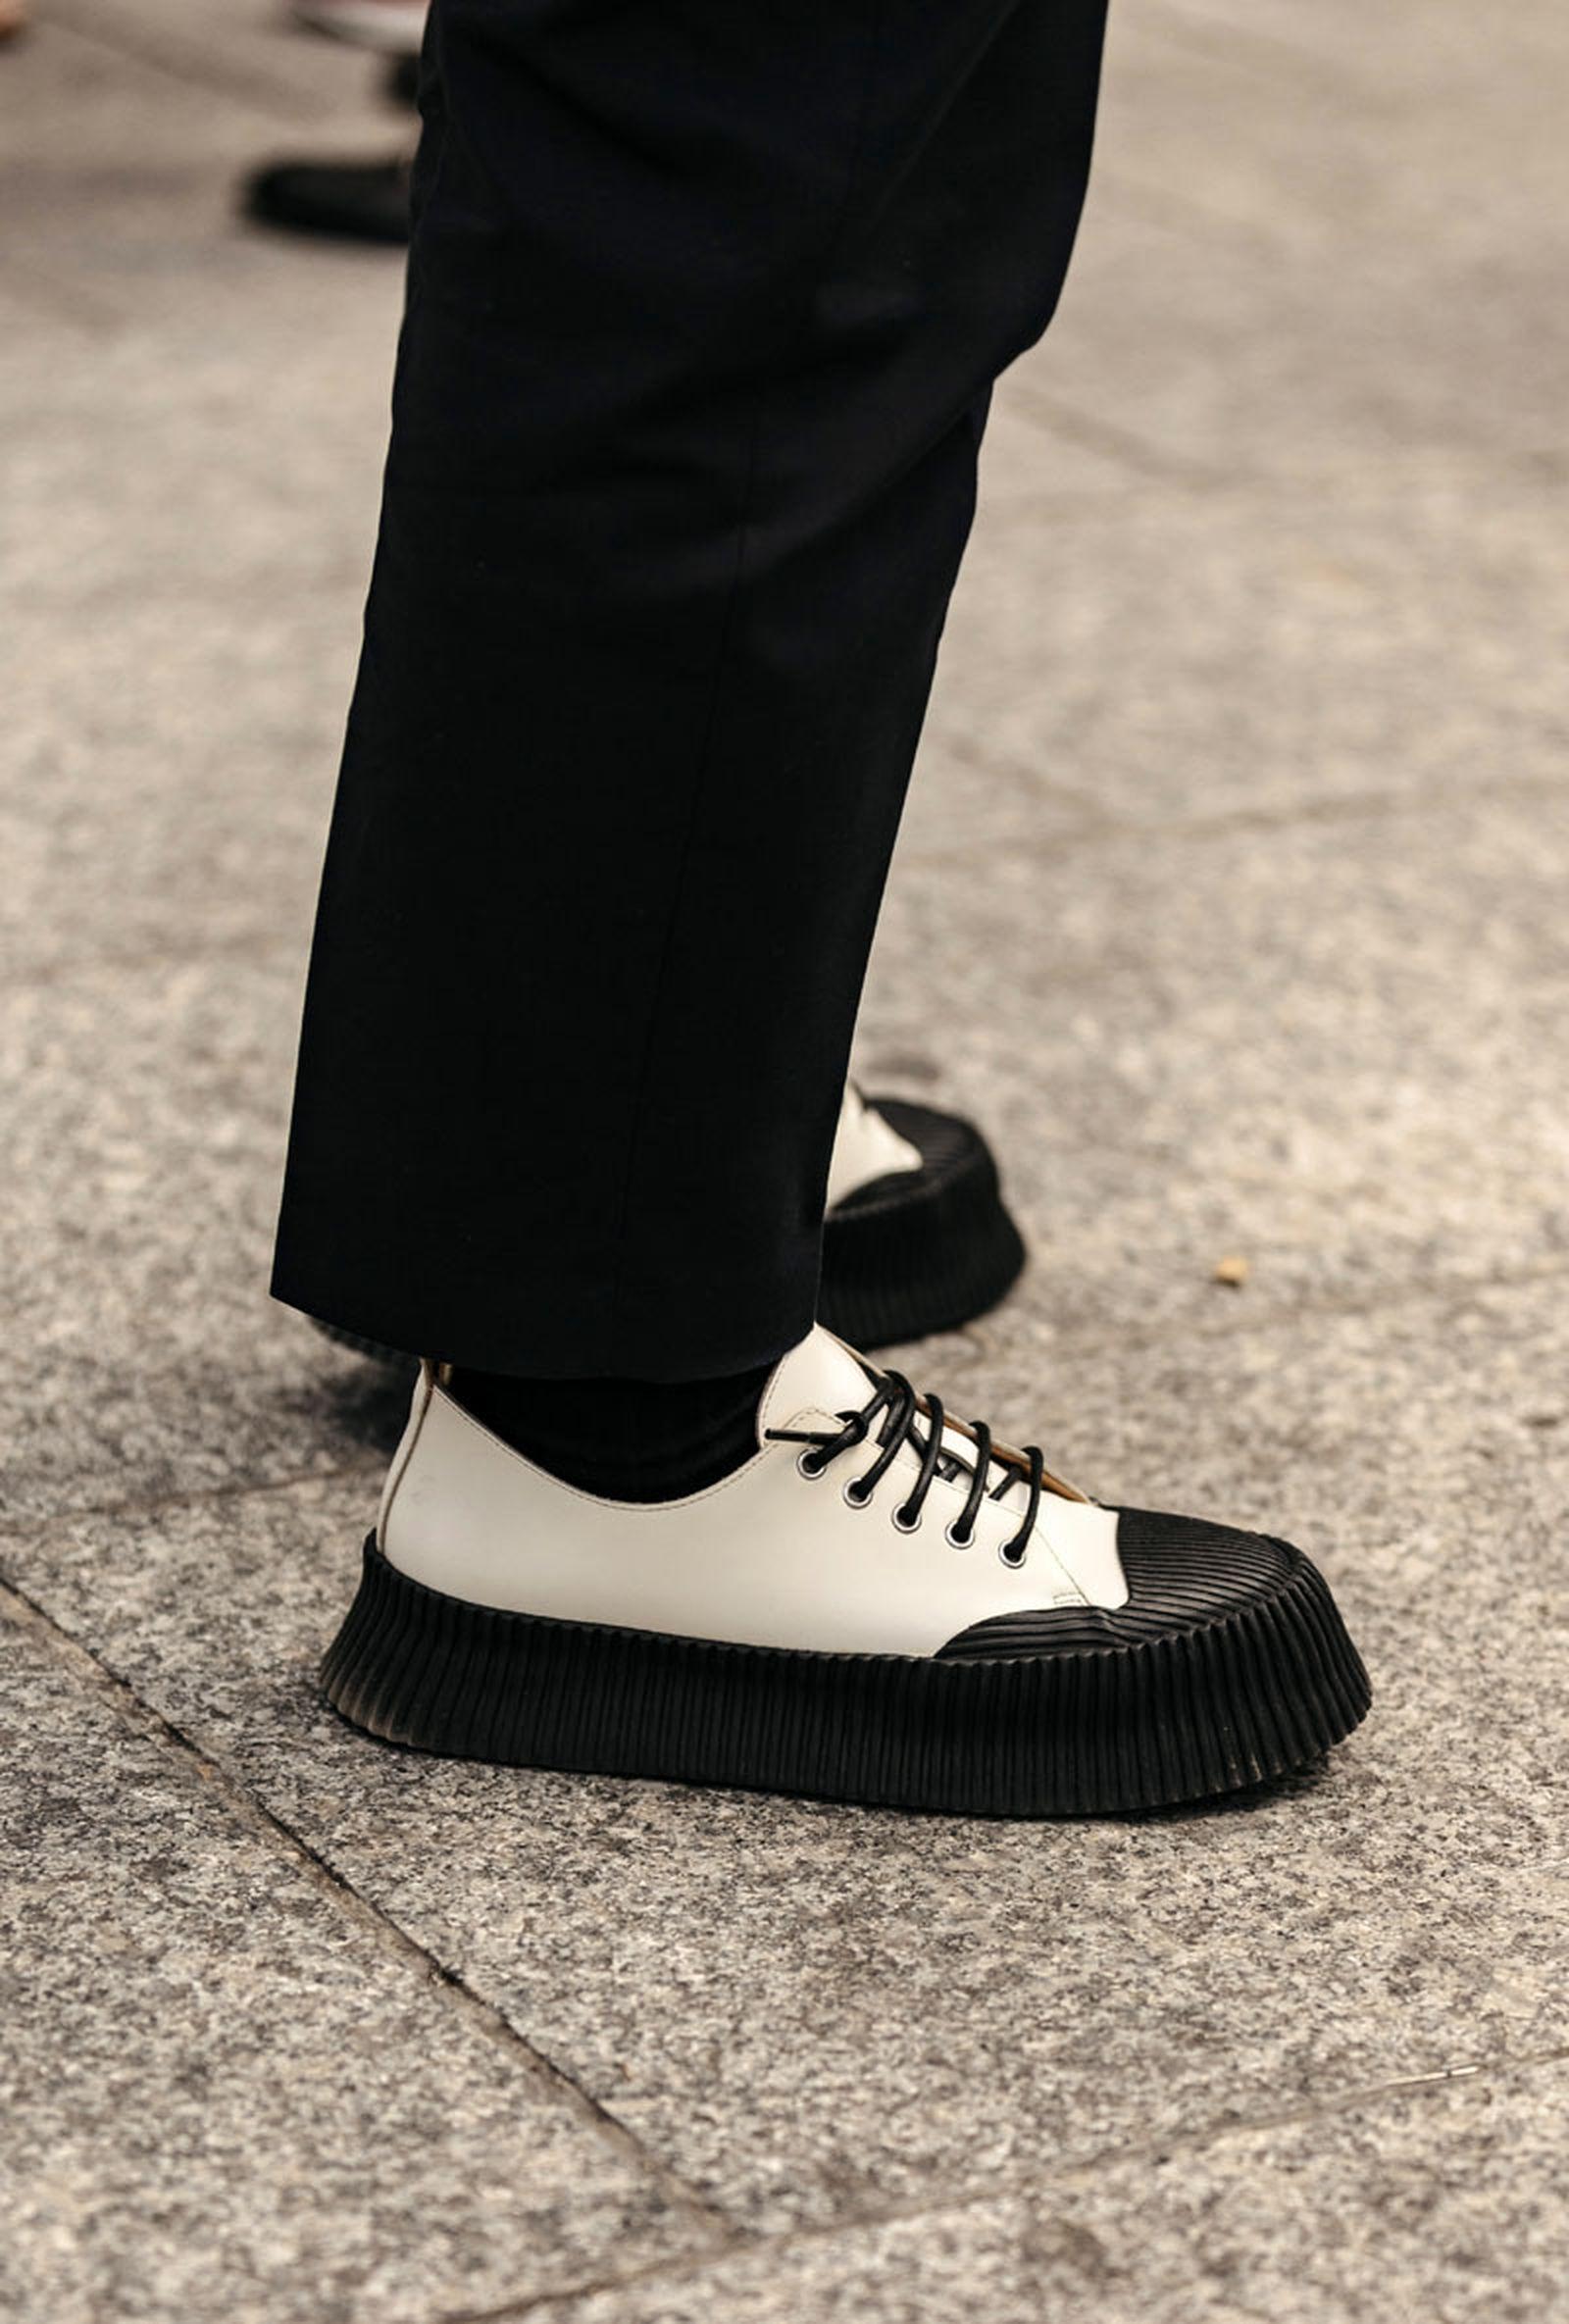 paris fashion week ss20 sneakers 011 Nike comme des garcons li ning